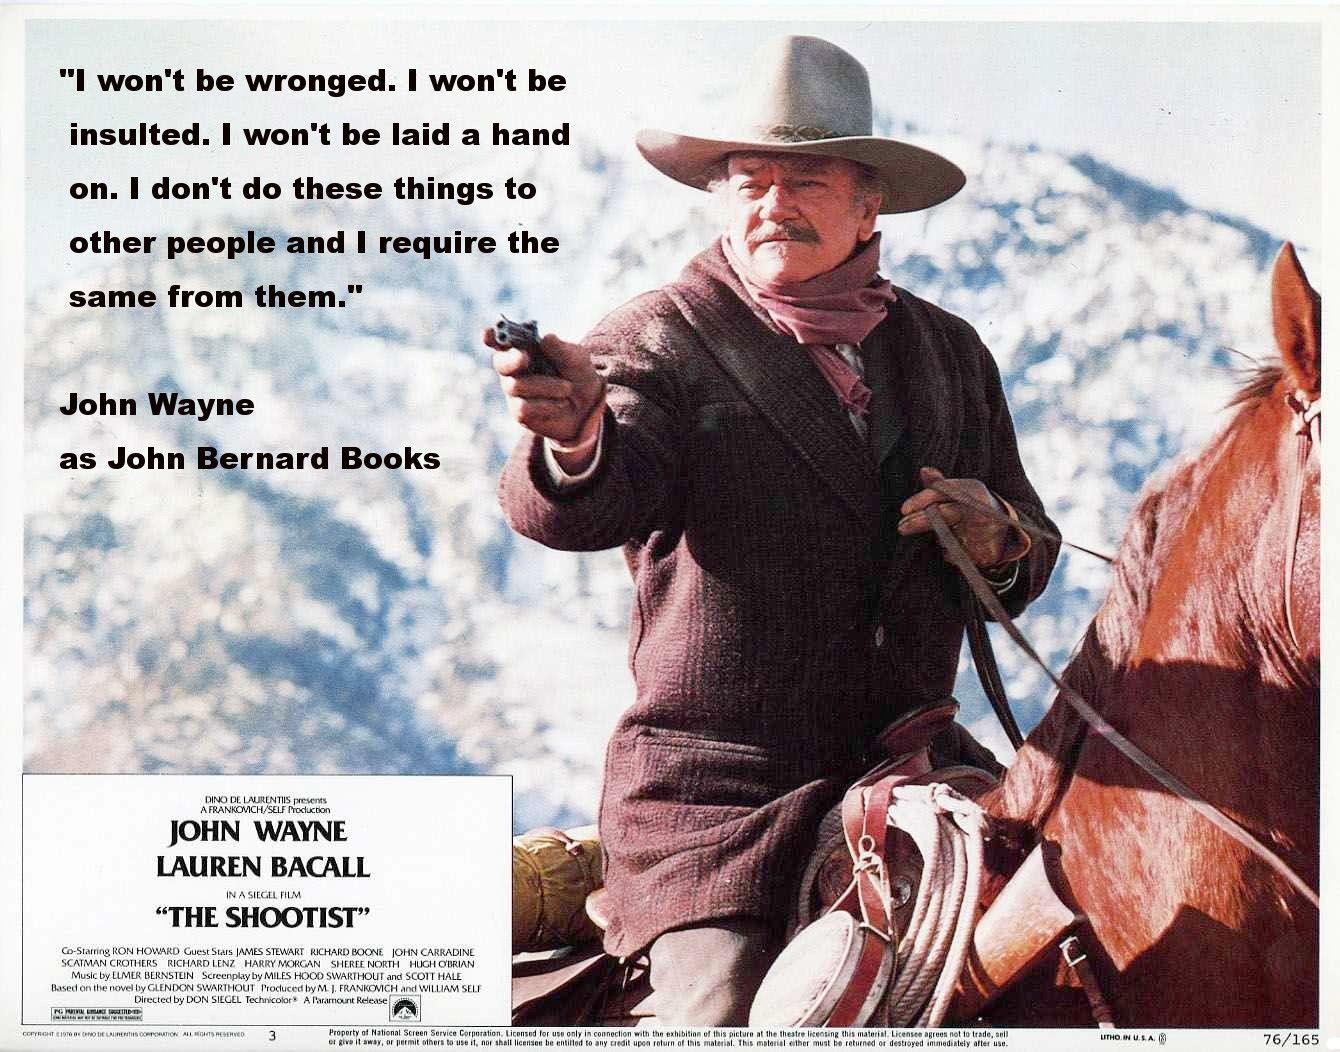 John Wayne Famous Quotes Worlds Best Quotes Best Quotes Best Quotes In The World John Wayne Quotes Cowboy Quotes John Wayne Movies